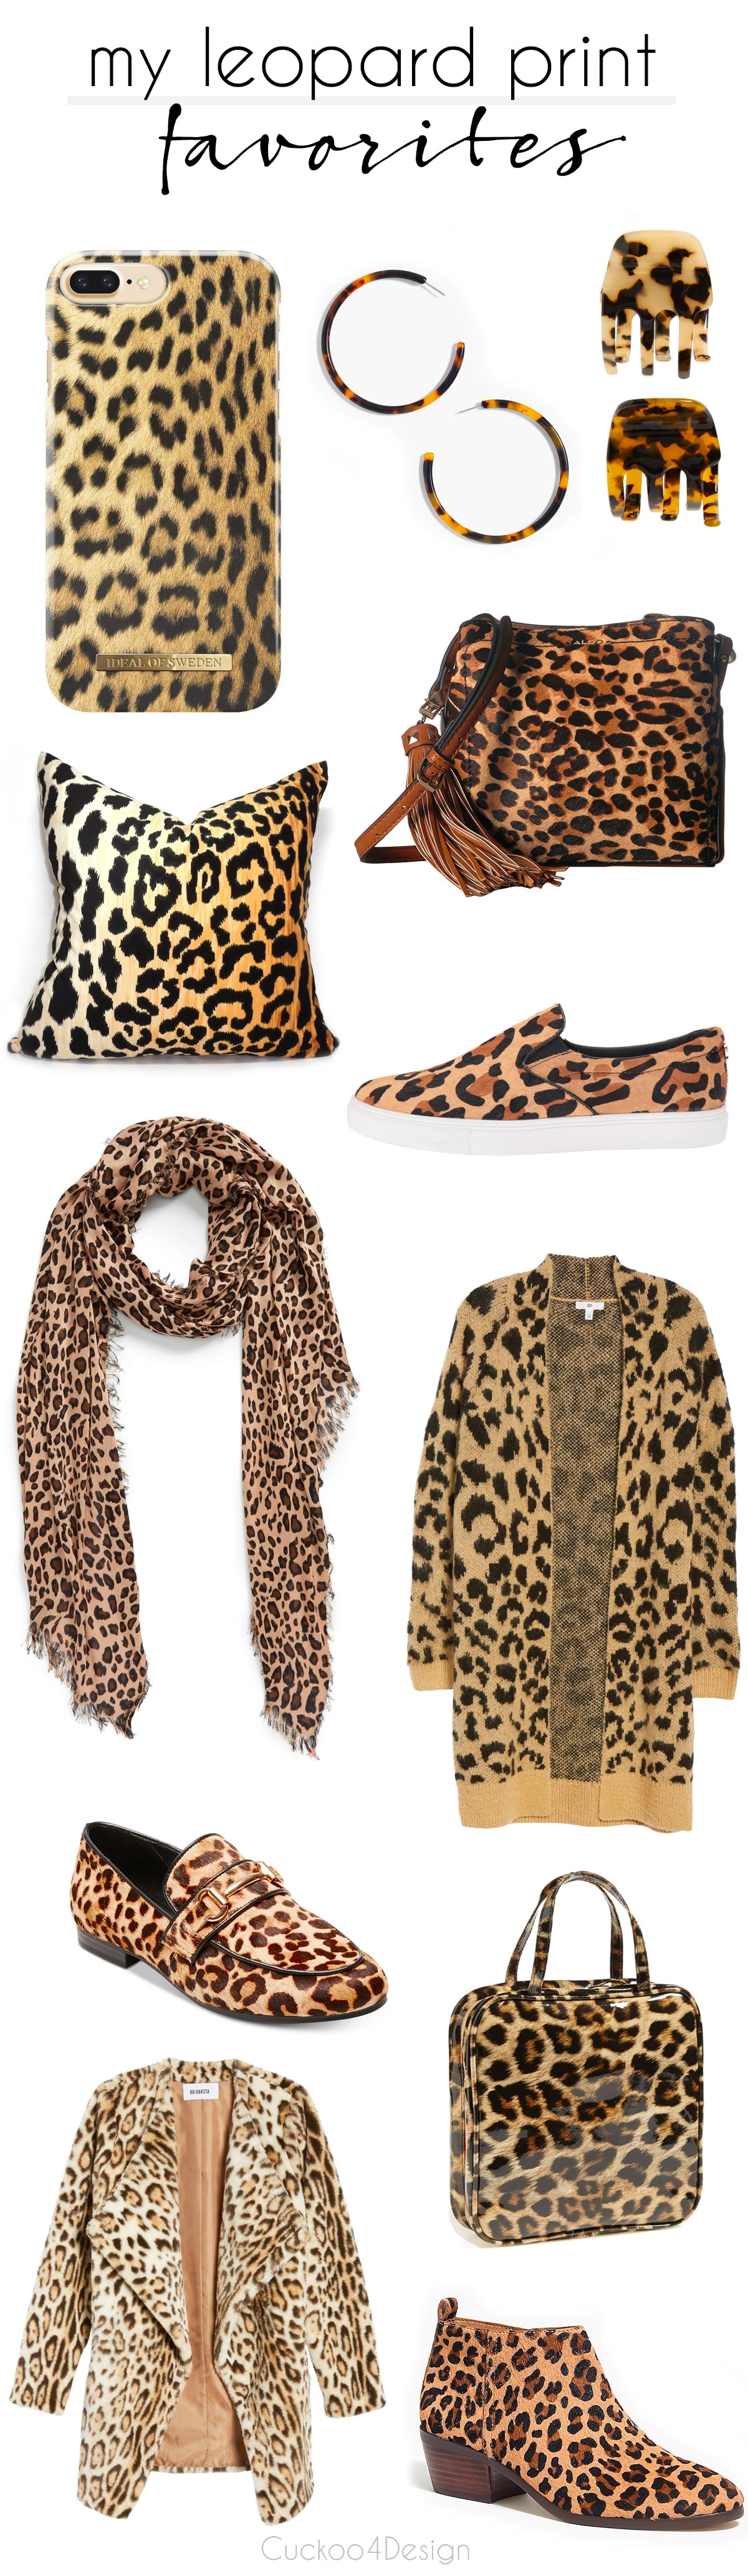 Braemore Jamil leopard print inspired favorites